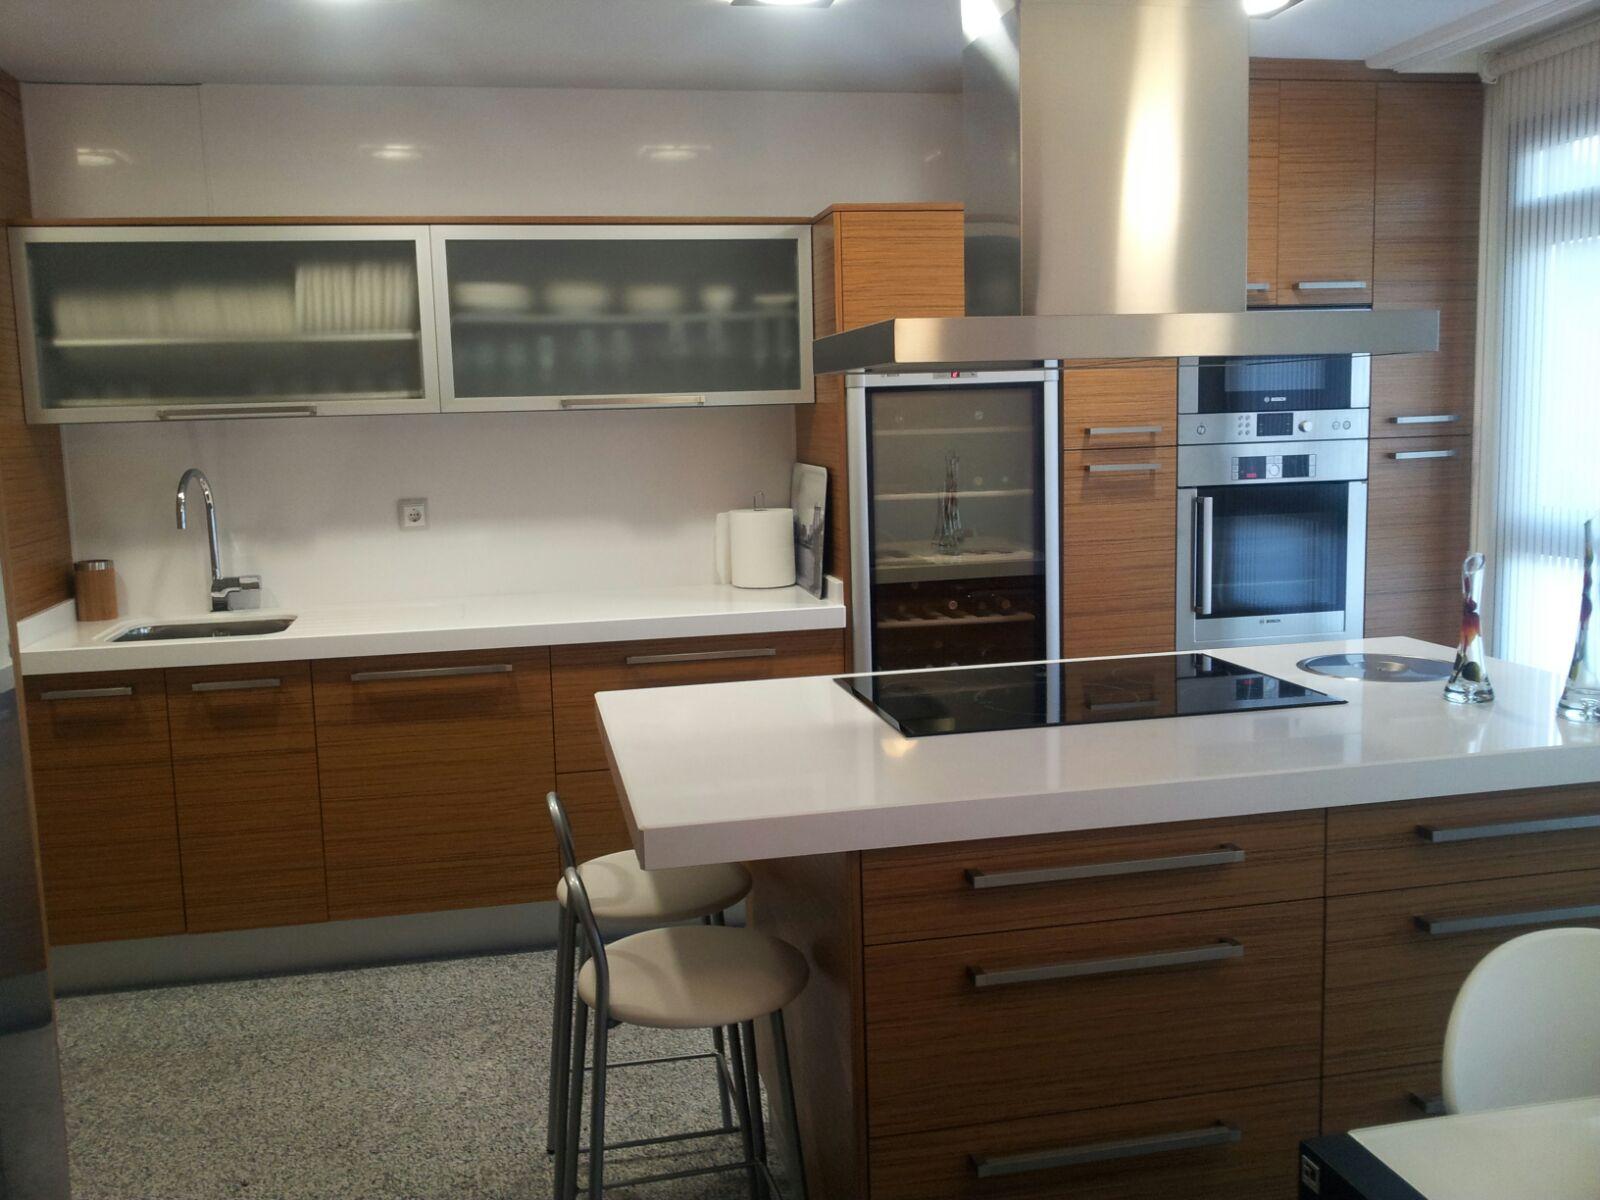 Cocina de teca - Carpinteros en Murcia